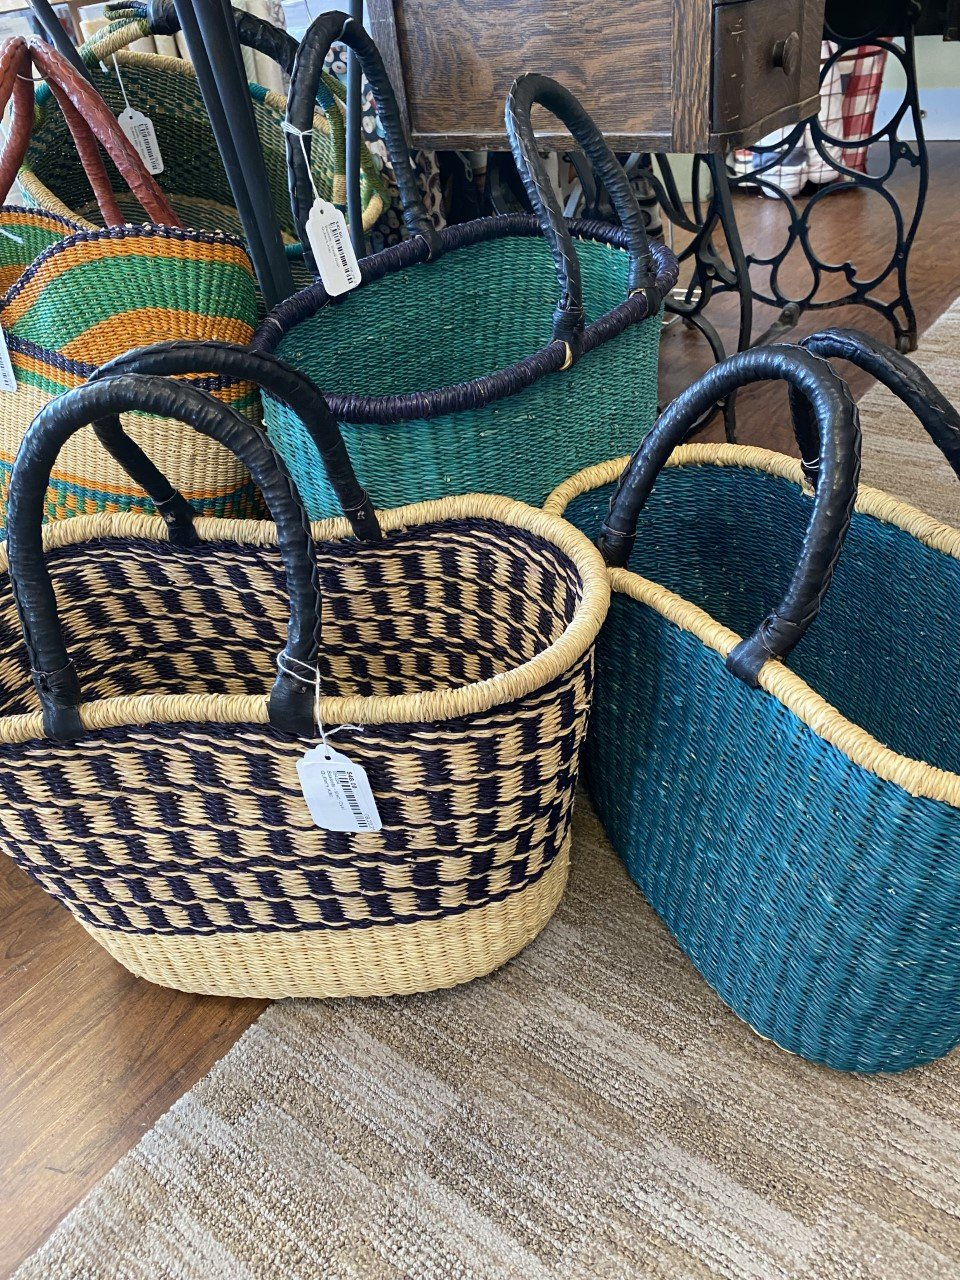 Baskets - Small U Oval w/ long handles